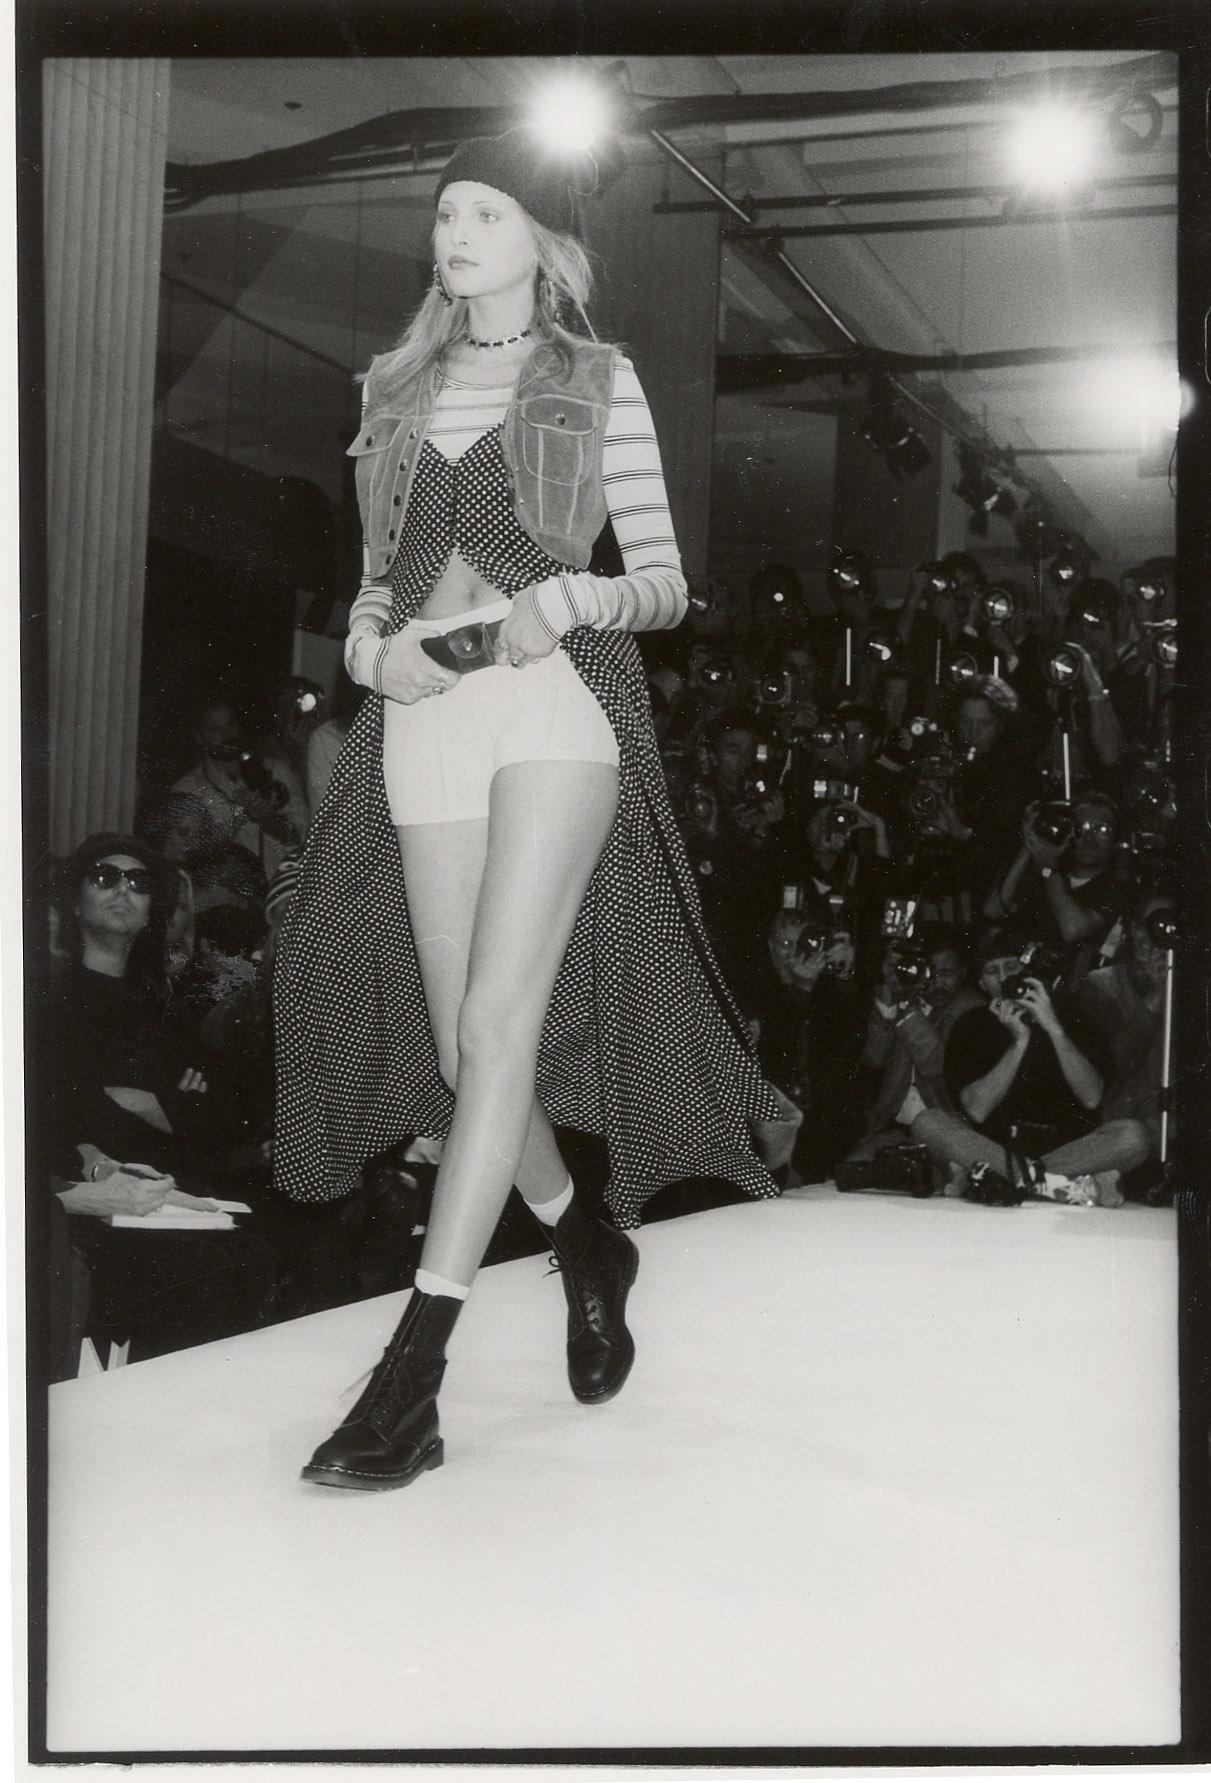 Marc Jacobs  从垃圾摇滚风格时装到进入路易·威登